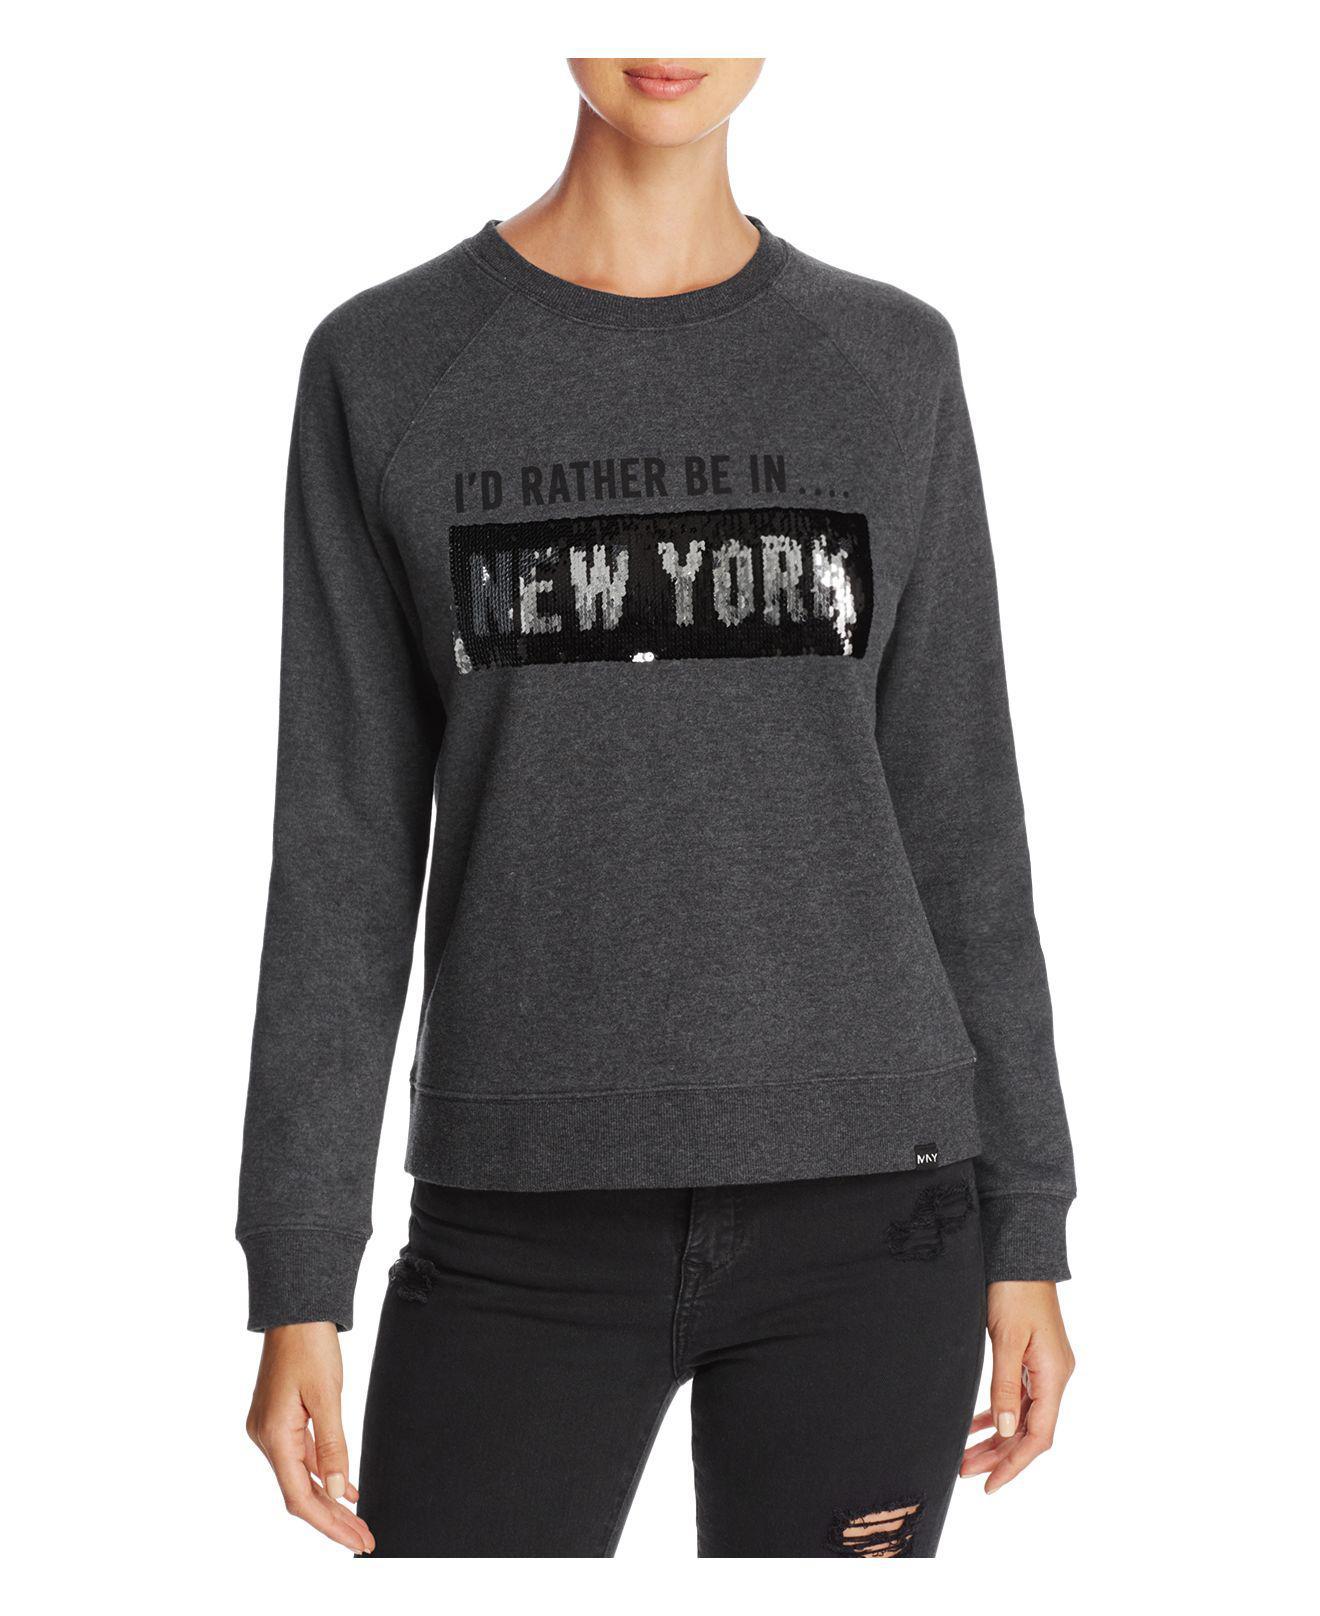 New York Performance: Marc New York Performance Sequin Graphic Sweatshirt